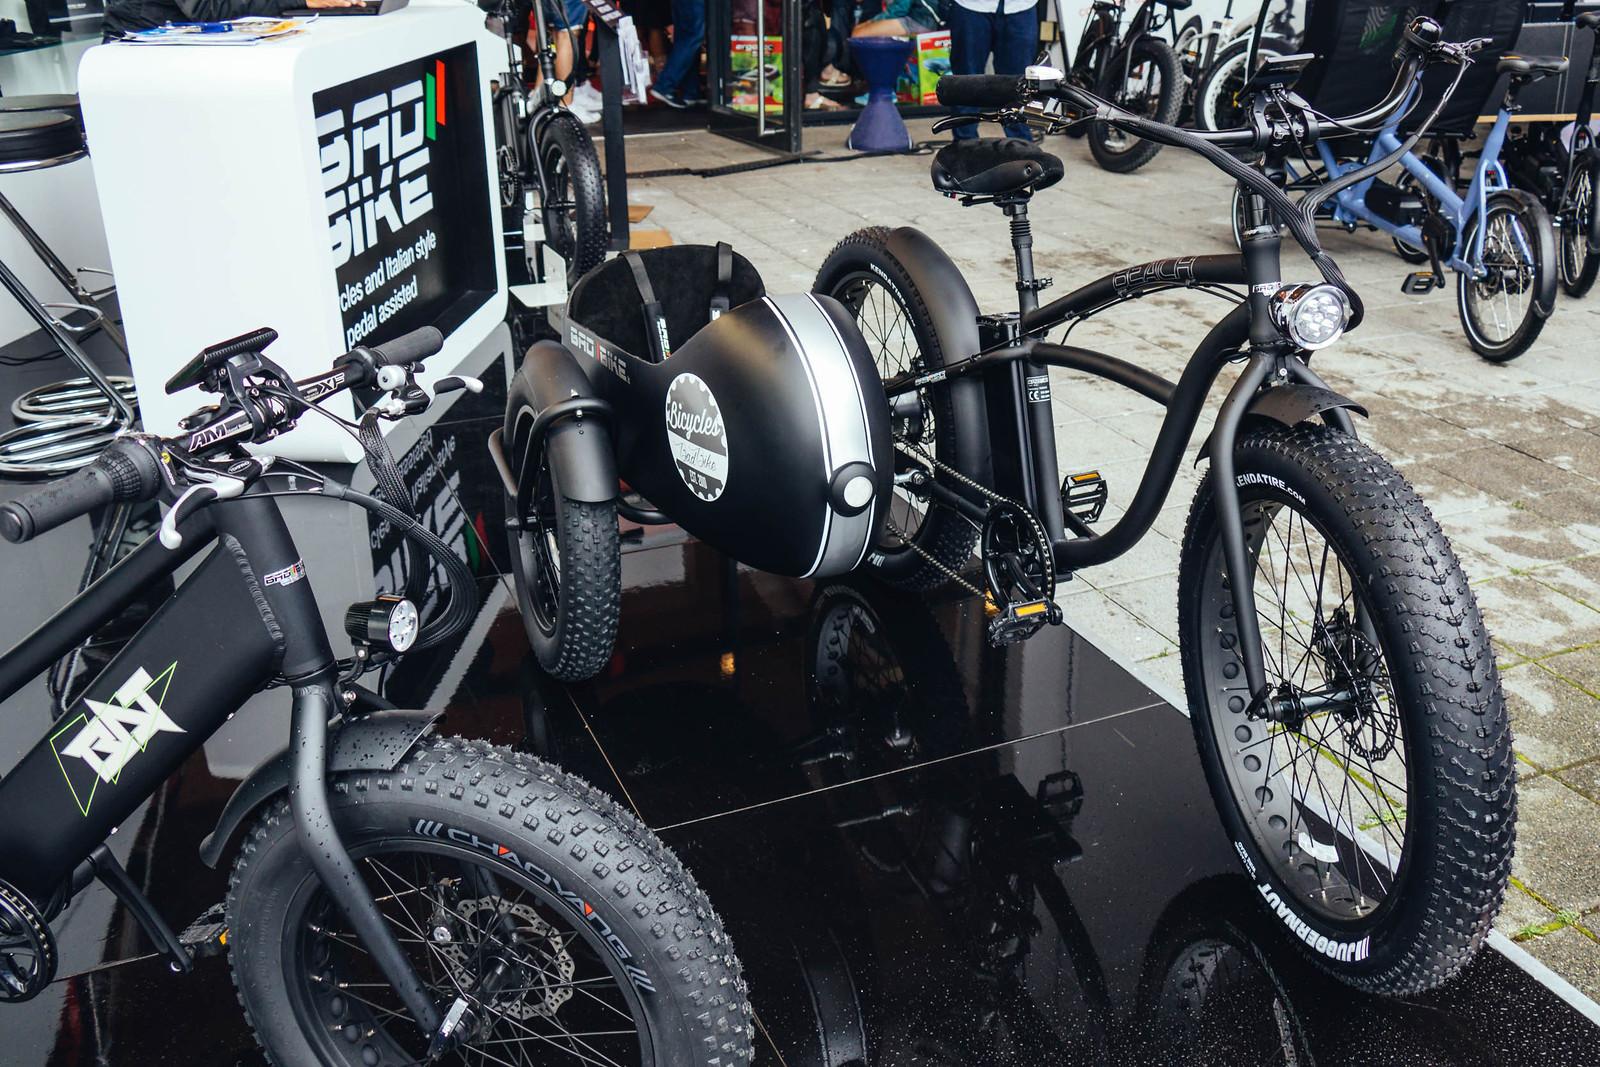 Ball and Chain - iceman2058 - Mountain Biking Pictures - Vital MTB